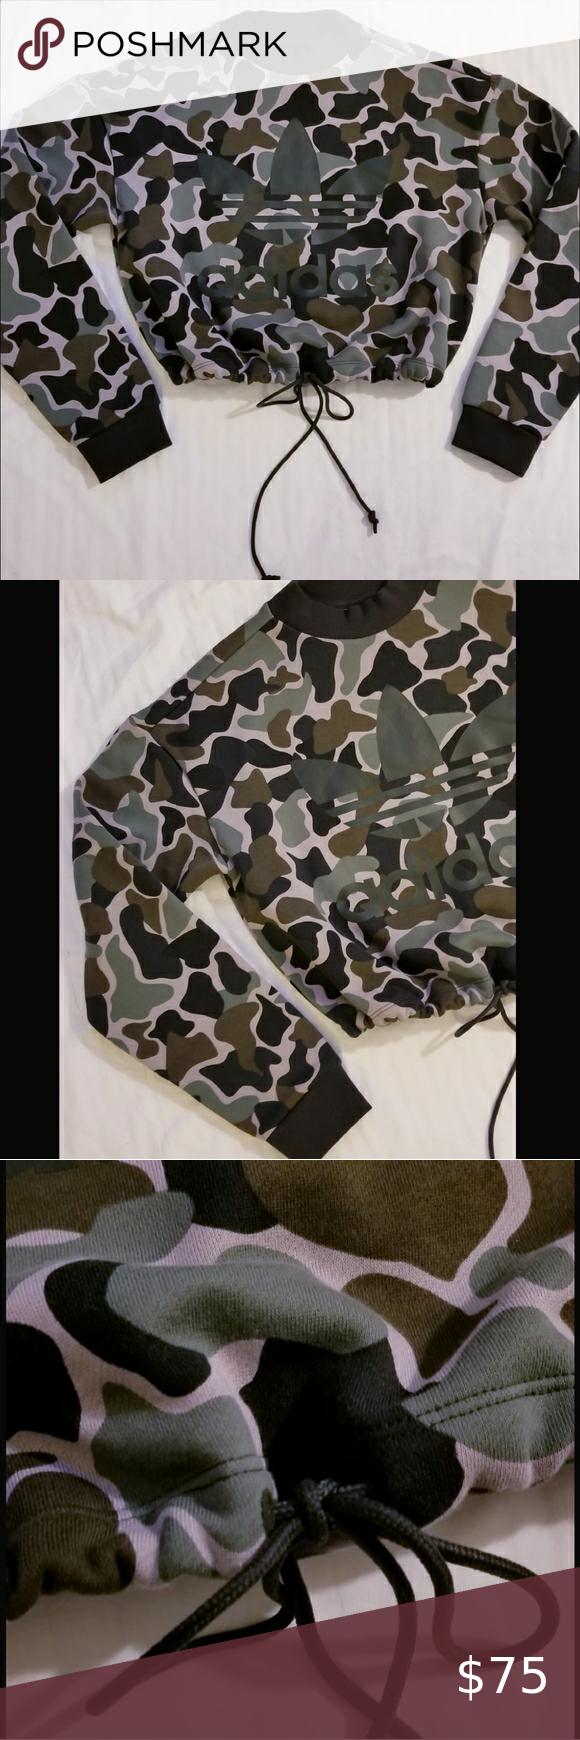 Adidas Camo Drawstring Bottom Crop Sweatshirt Nwt Nwt Large Camo Print W Large Trefoil Logo On The Rader Side Espec Adidas Camo Crop Sweatshirt Drawstring [ 1740 x 580 Pixel ]